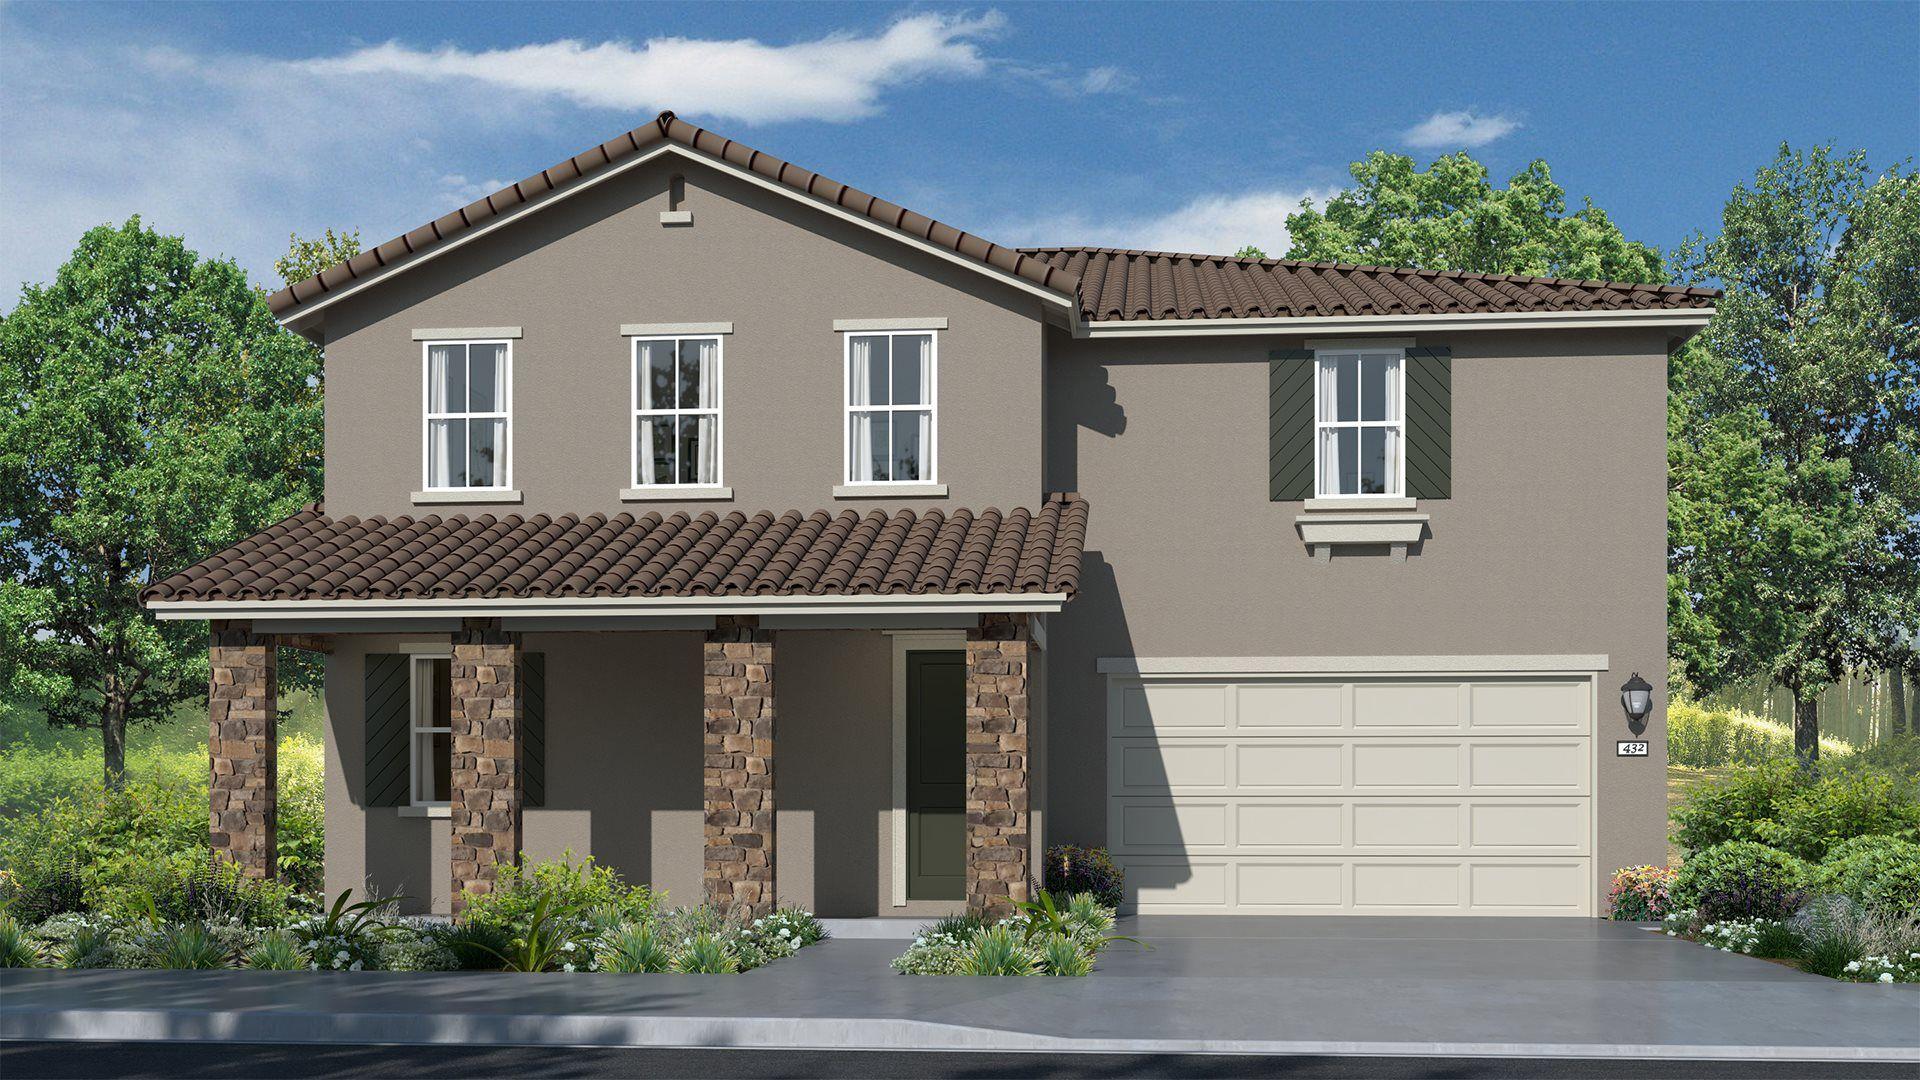 Residence 3028 | Elevation C